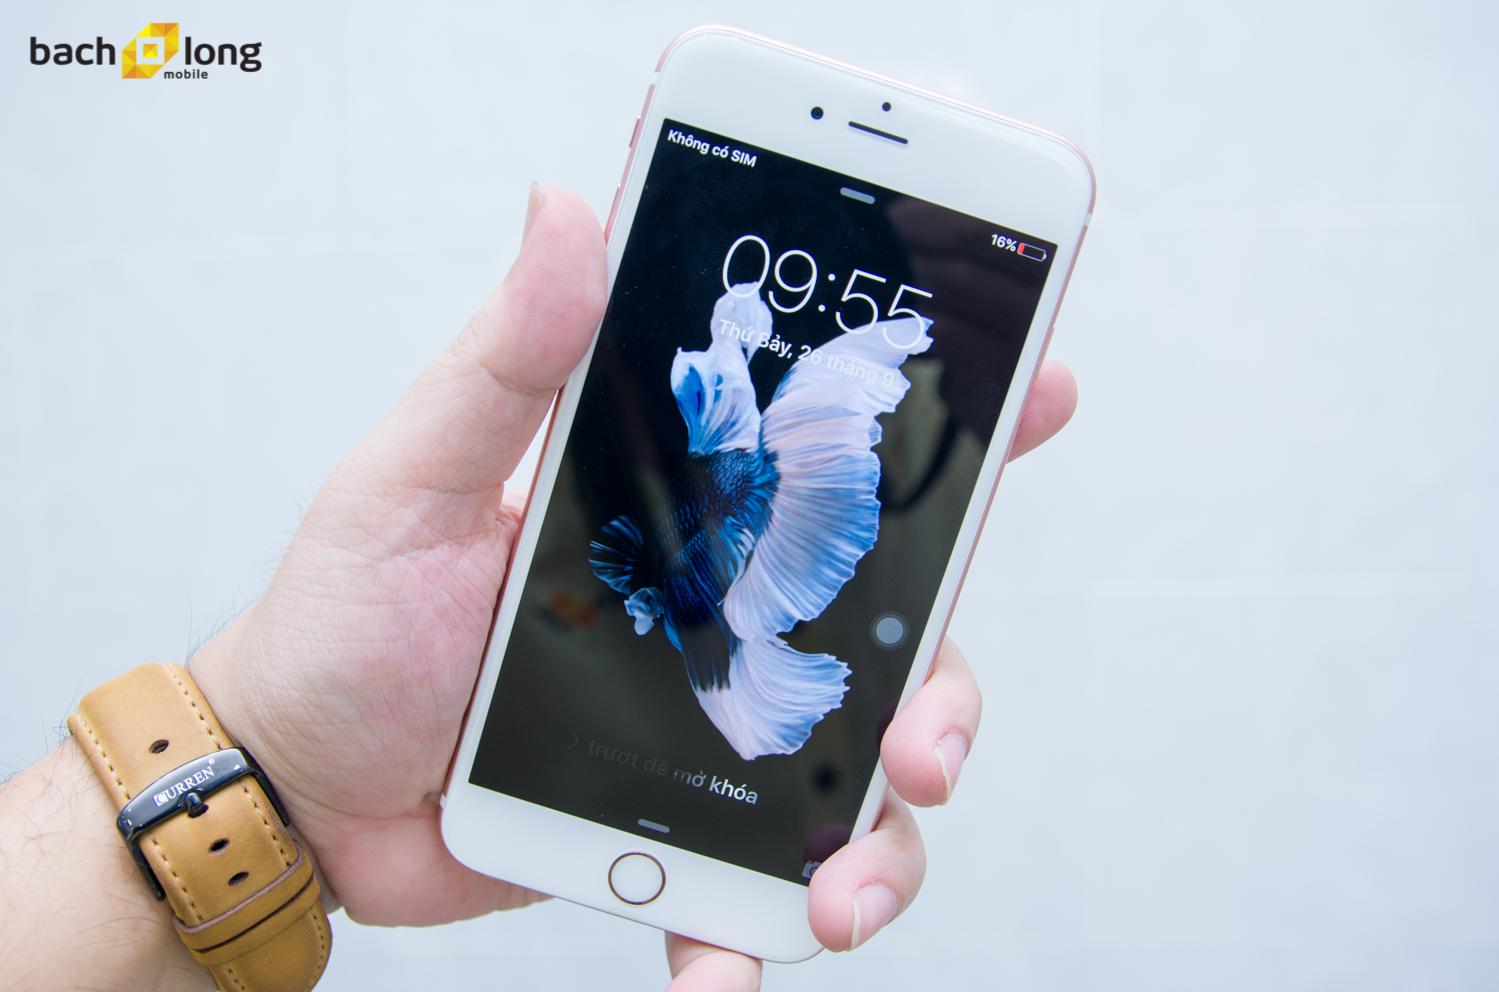 thay camera trước iPhone 6s plus